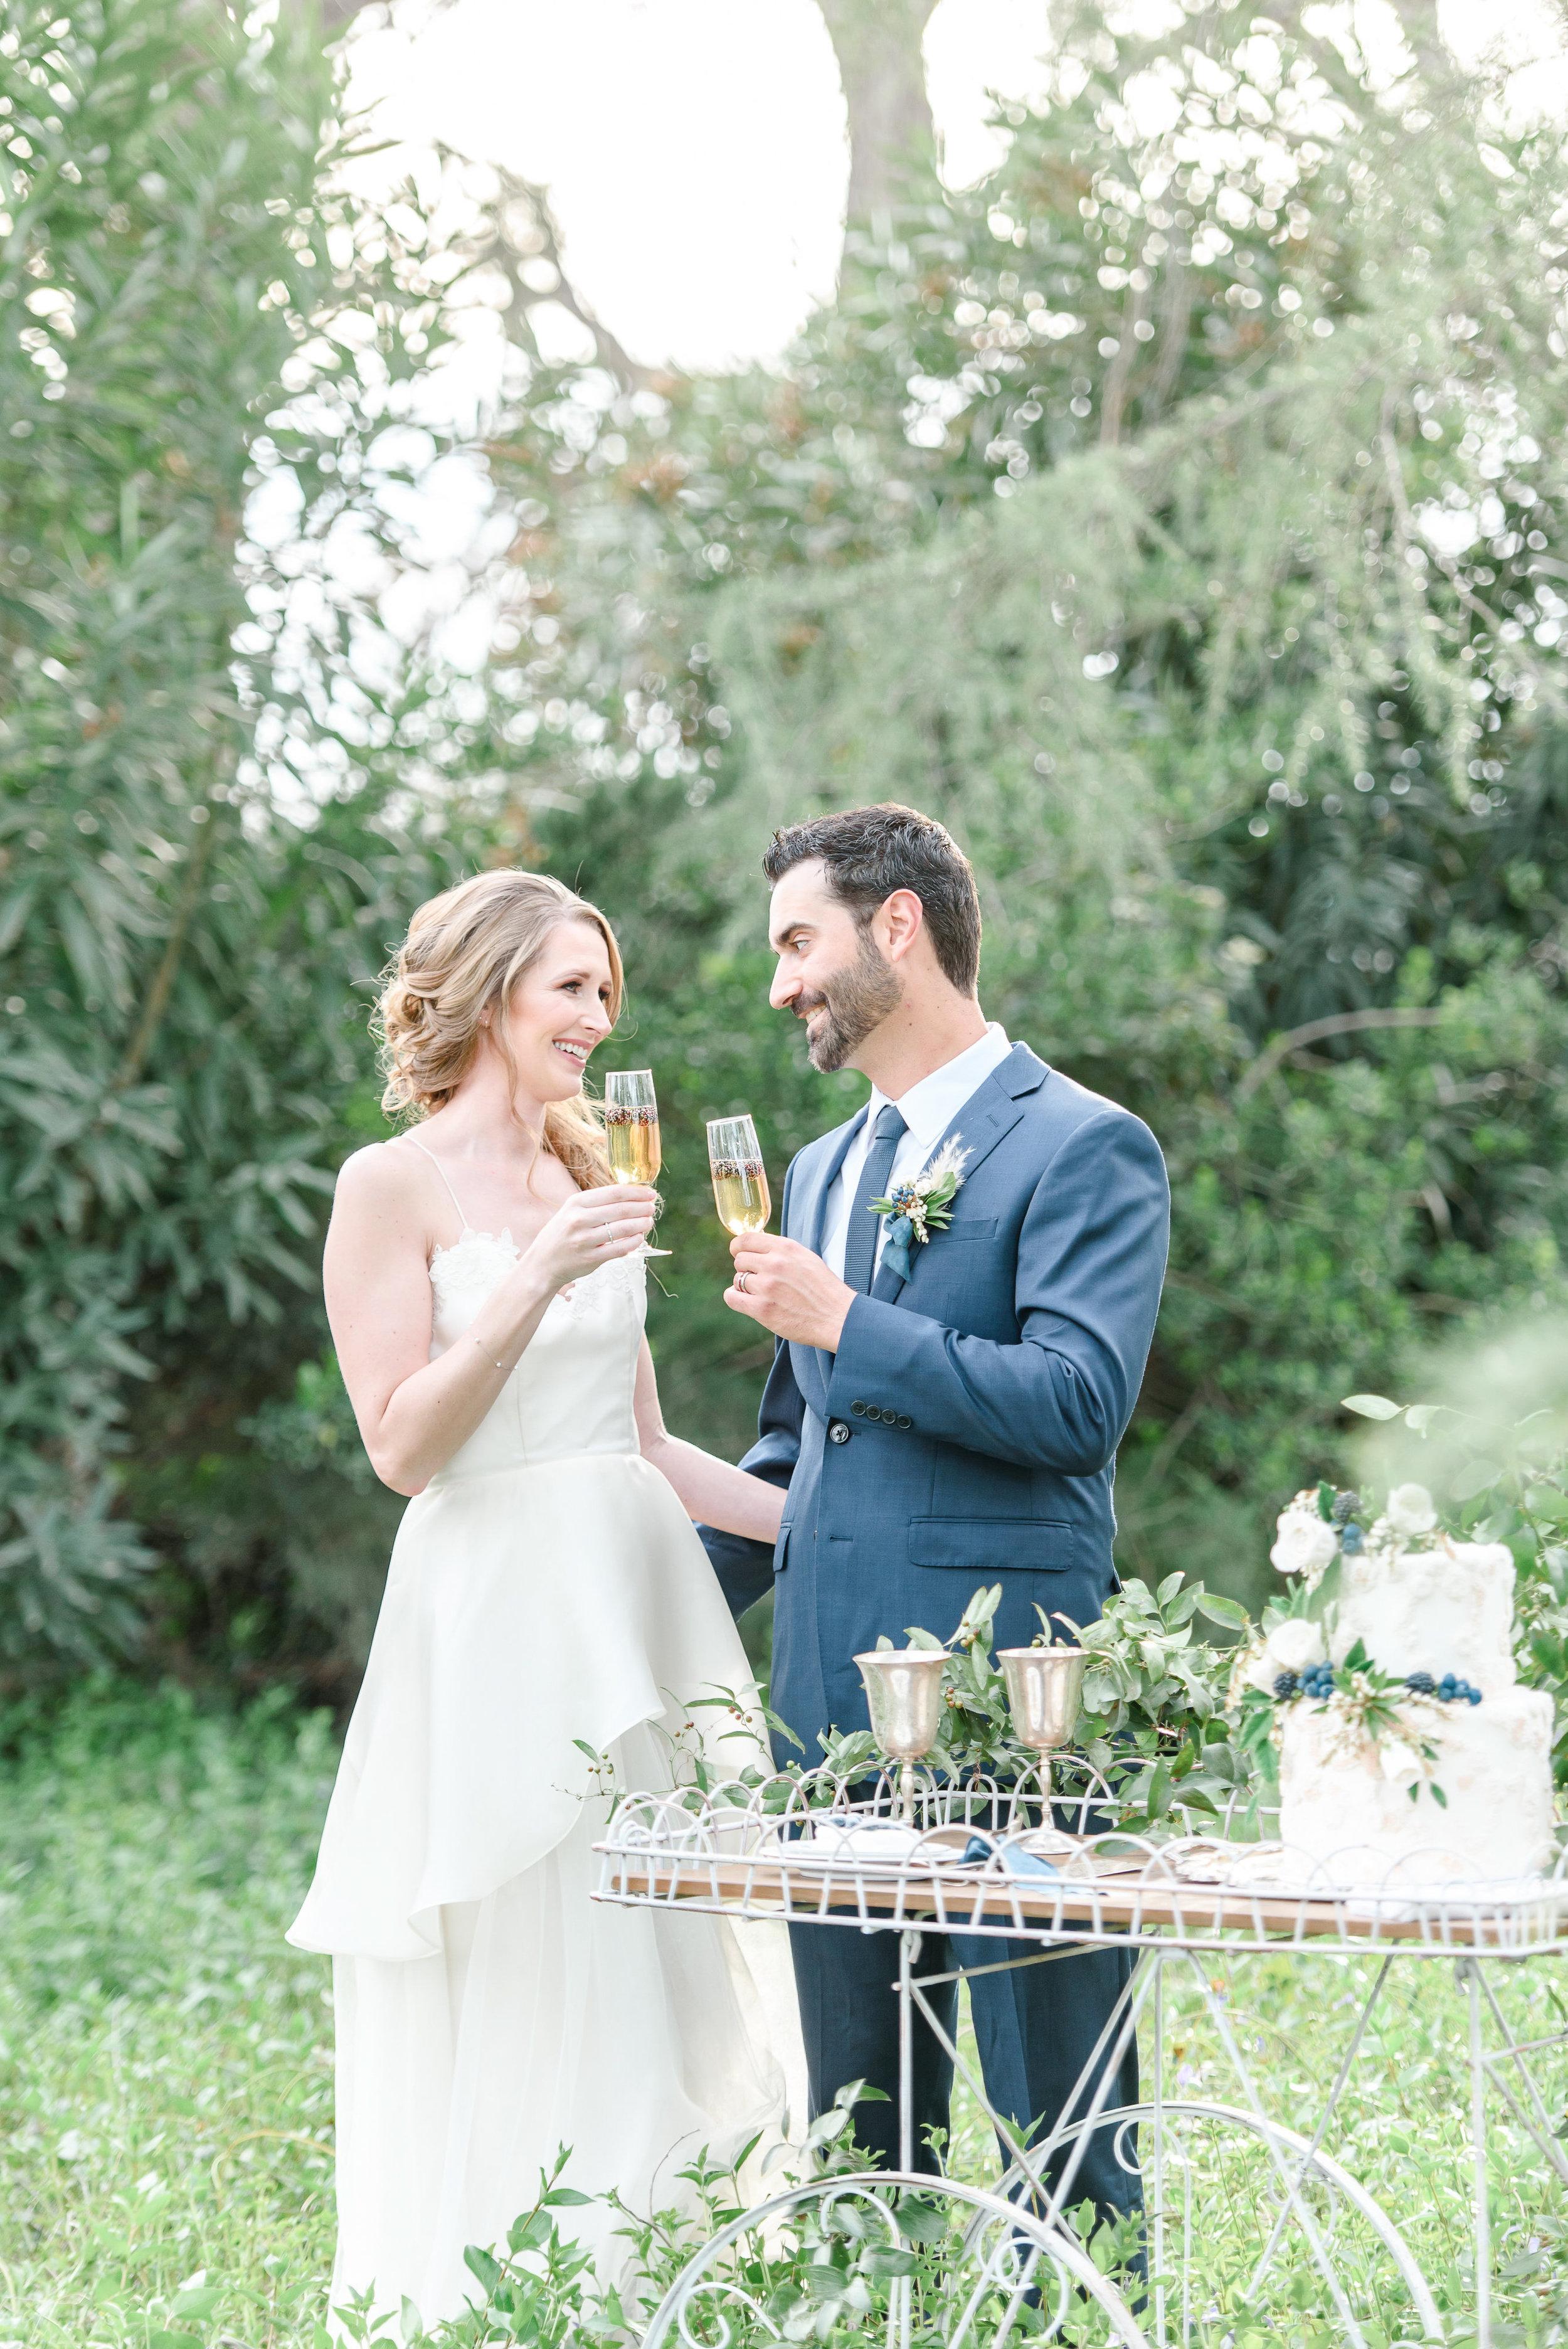 Cake Cutting Photo | Garden Wedding Inspiration